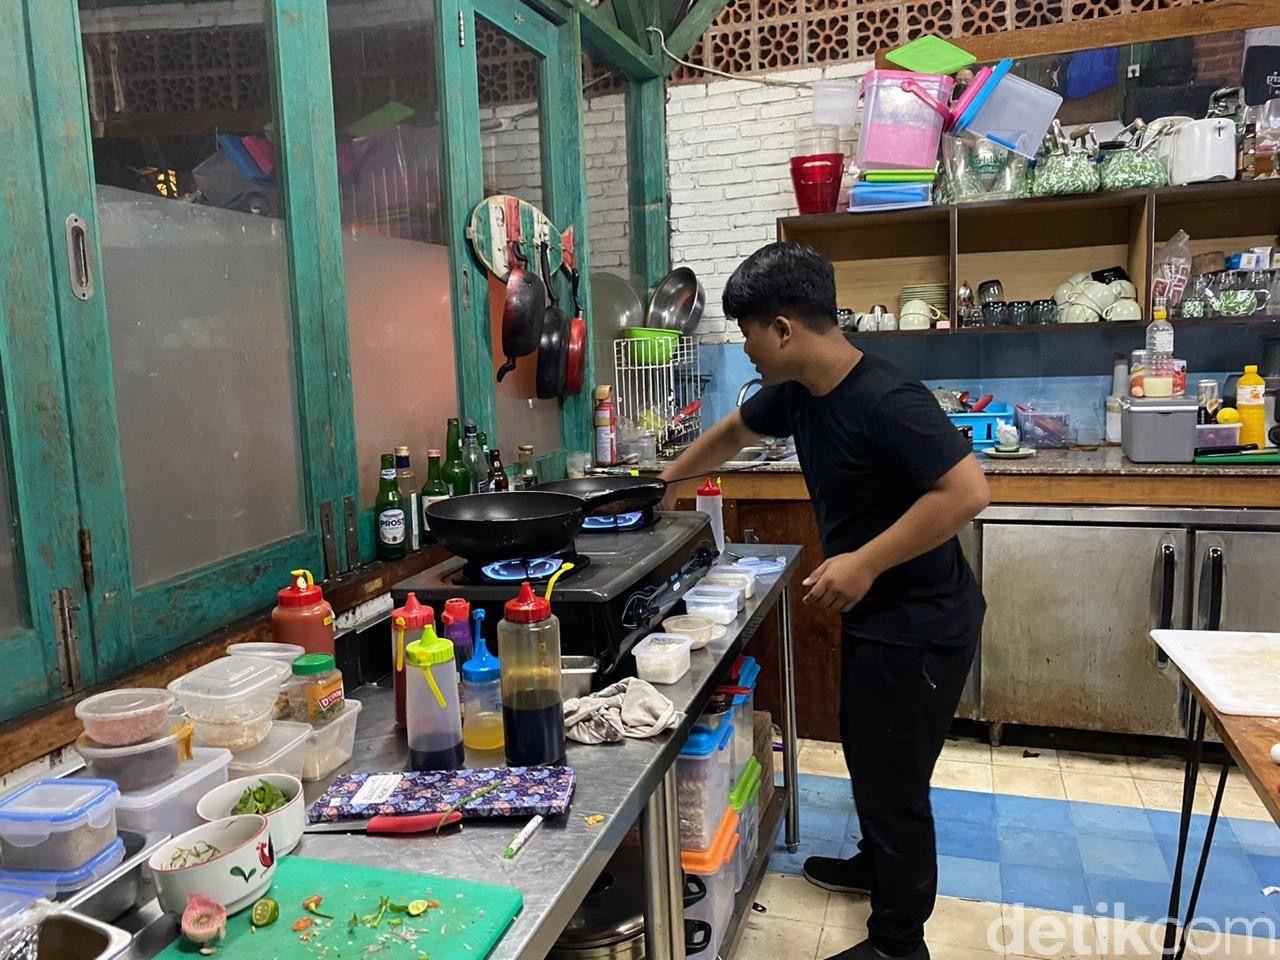 Keren! Restoran di Bali Ini Didirikan Oleh Para Korban PHK